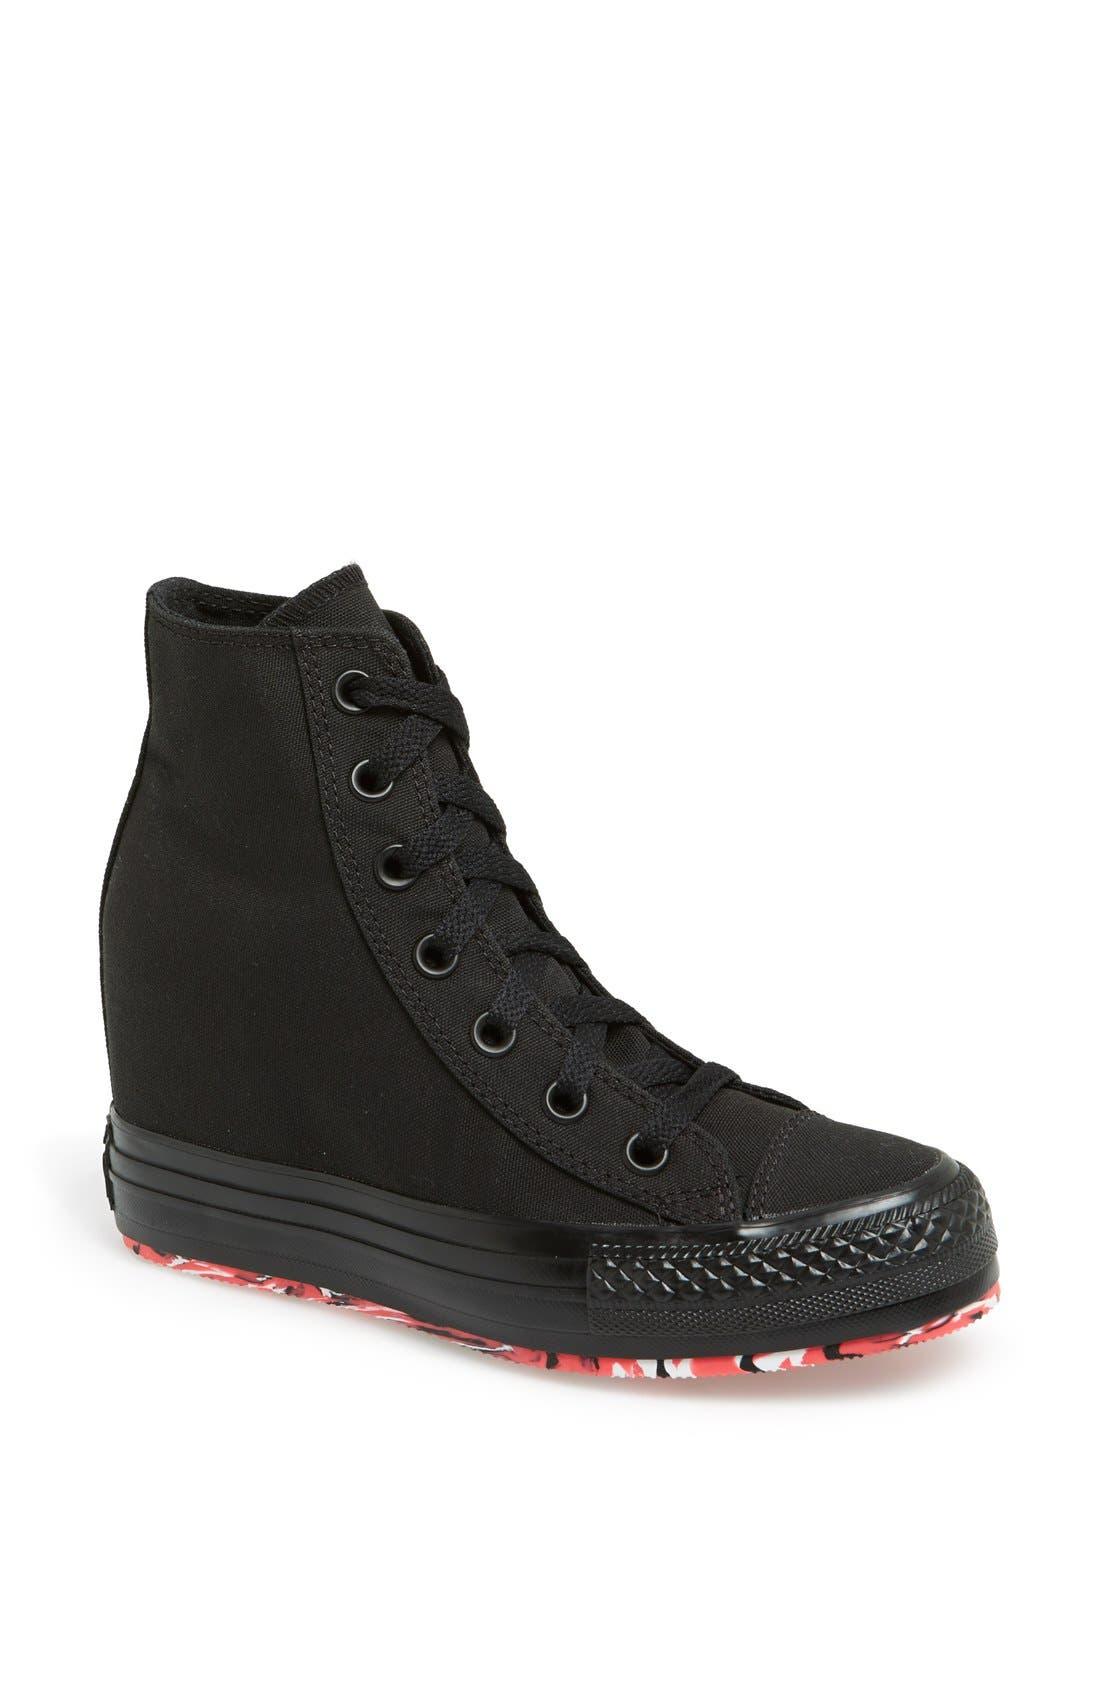 Main Image - Converse Chuck Taylor® All Star® High Top Wedge Sneaker (Women)